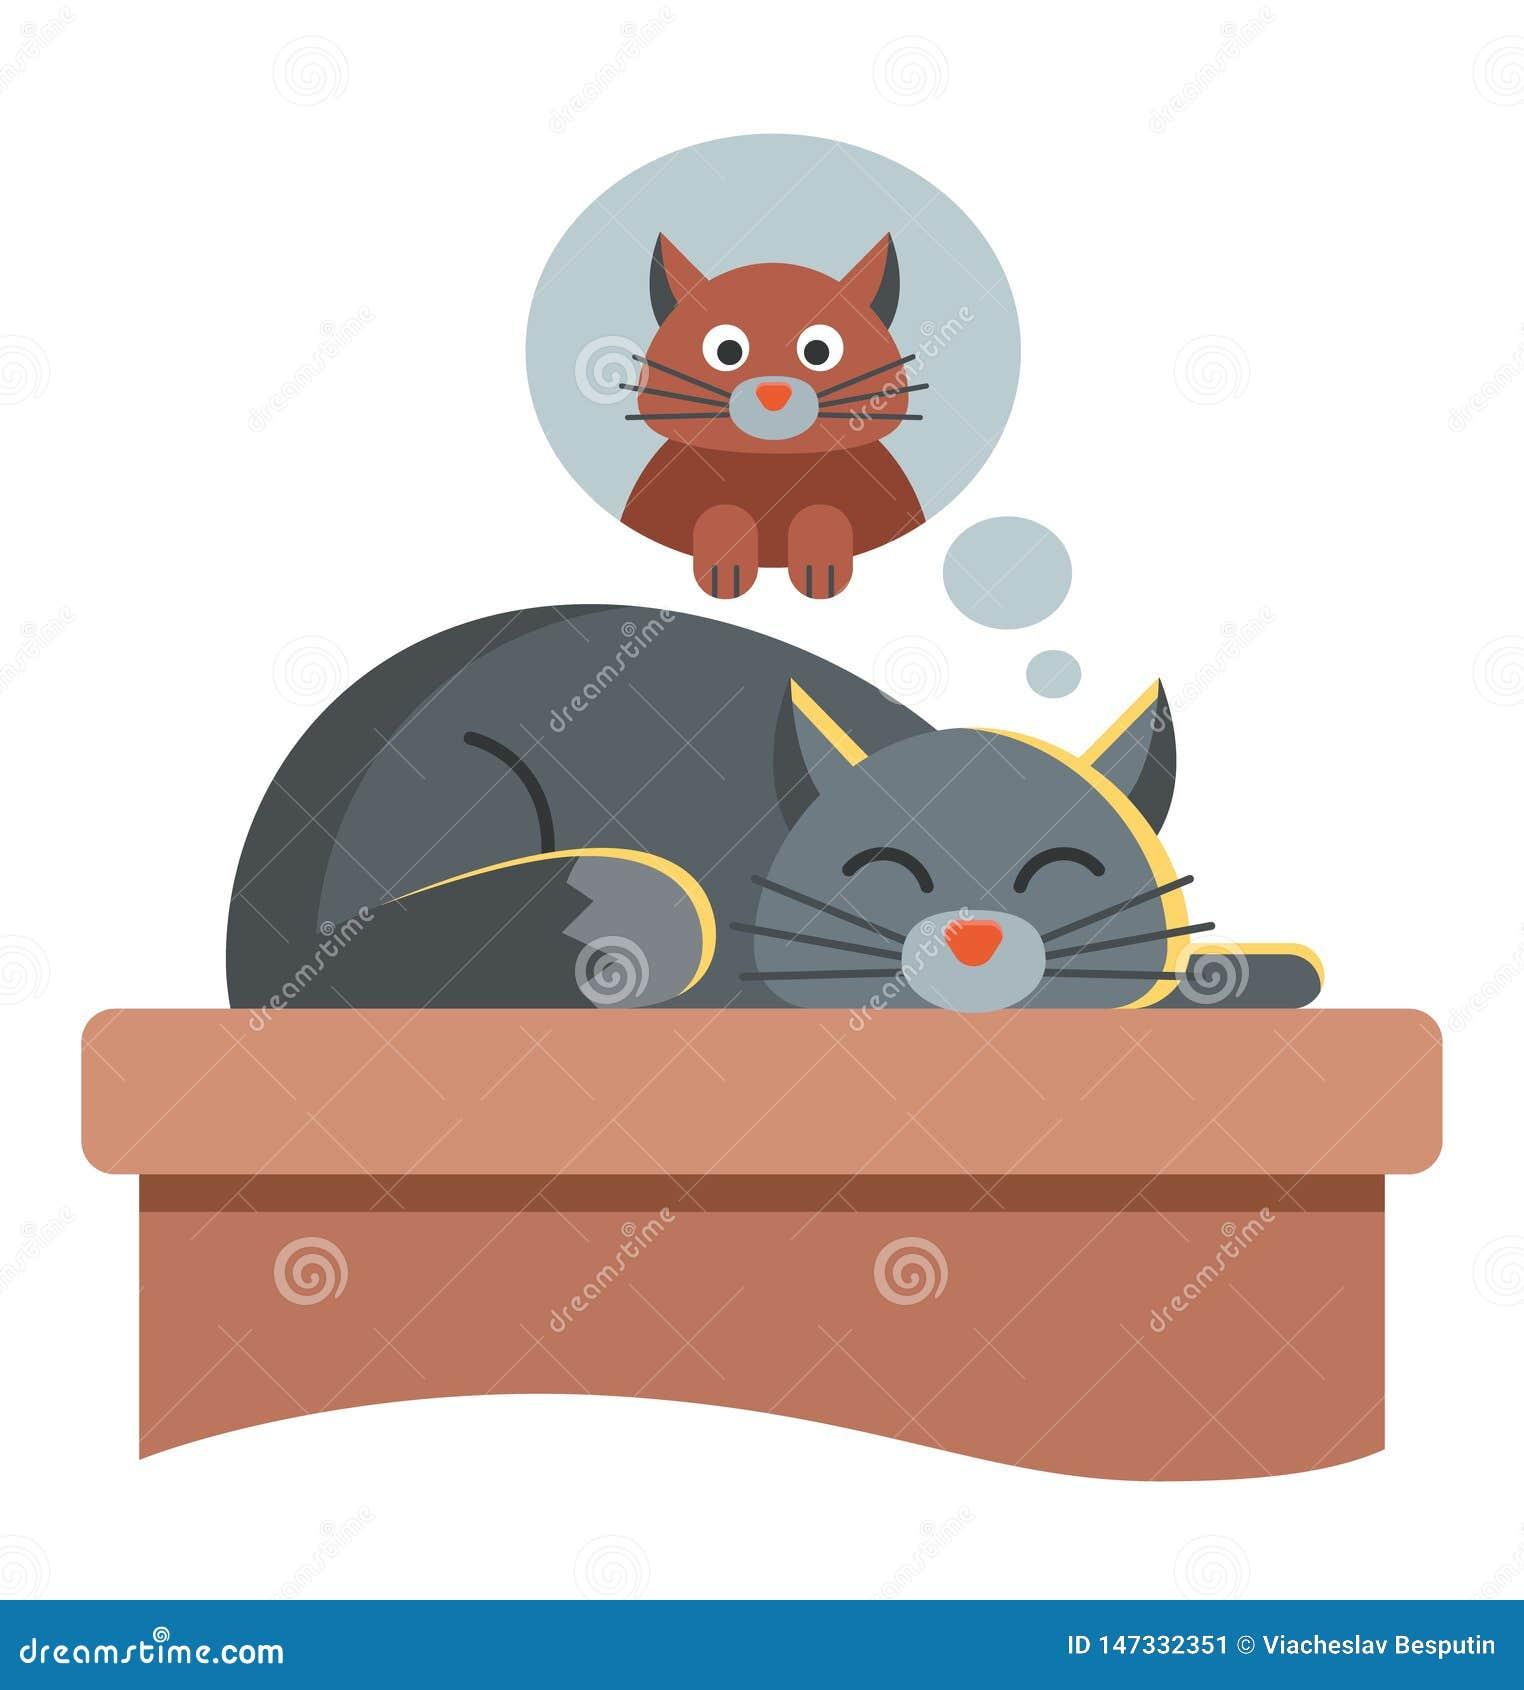 Cute cat dreams of another cat.